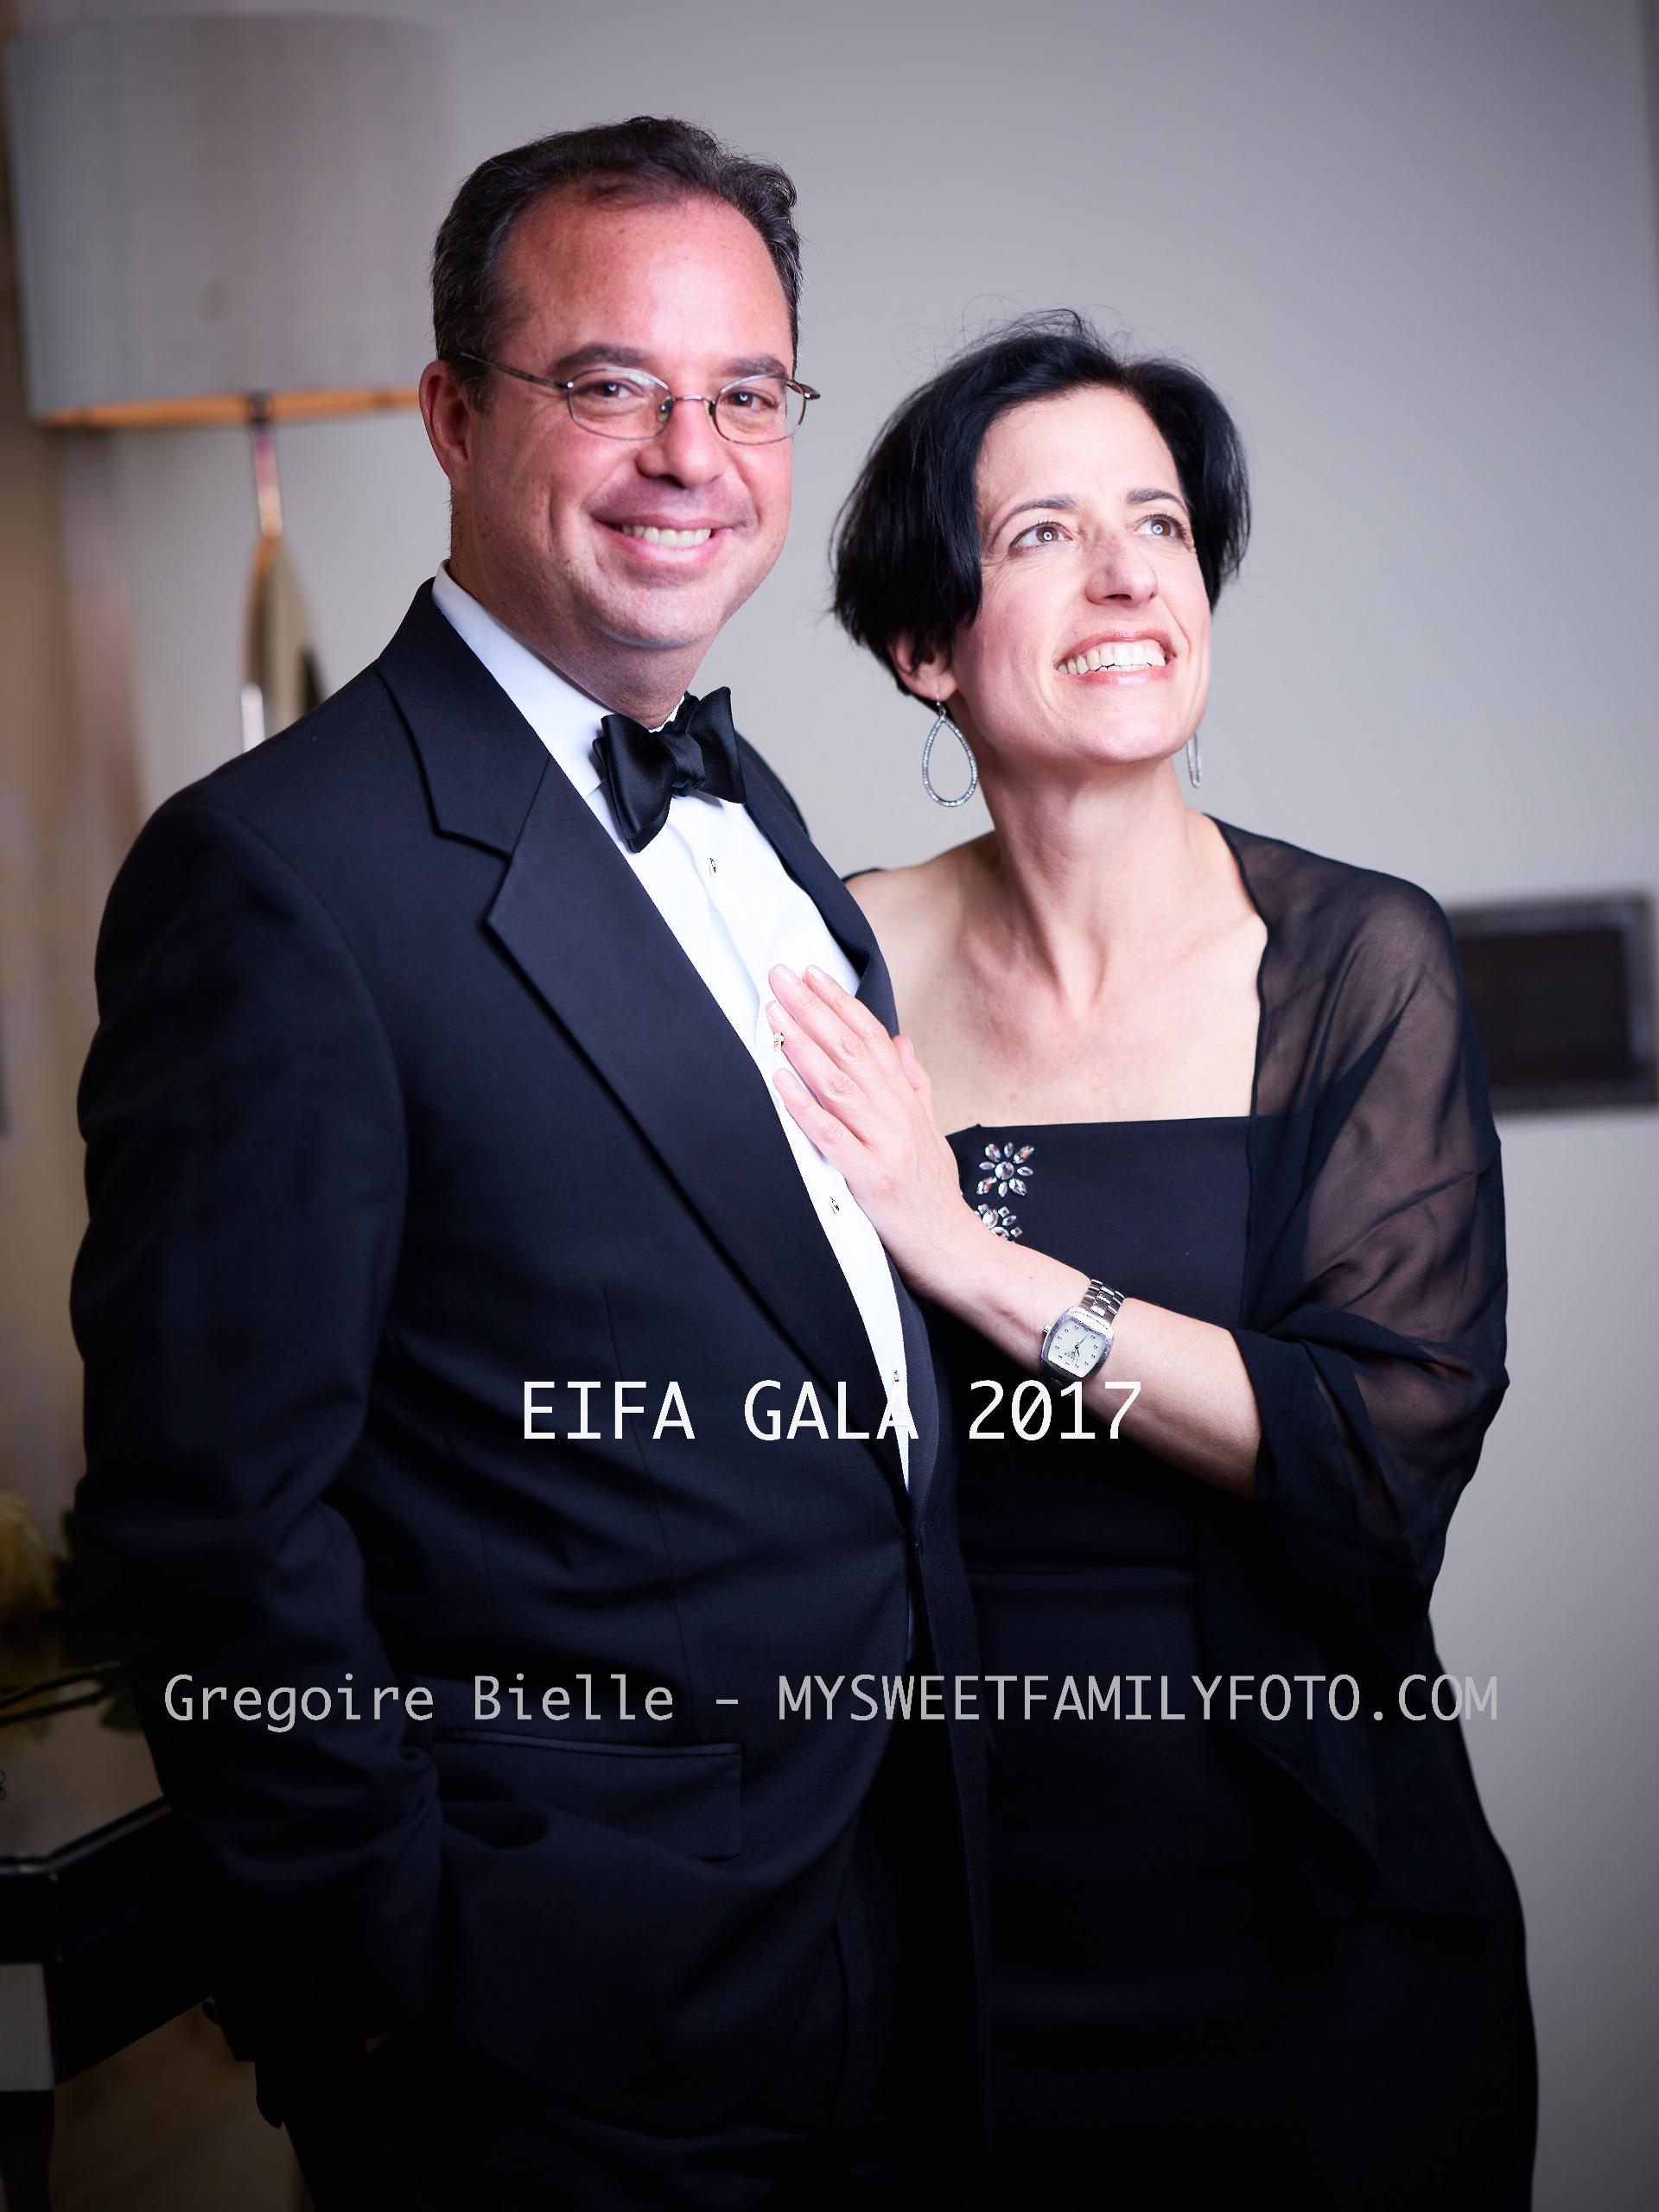 EIFA GALA 1267.jpg